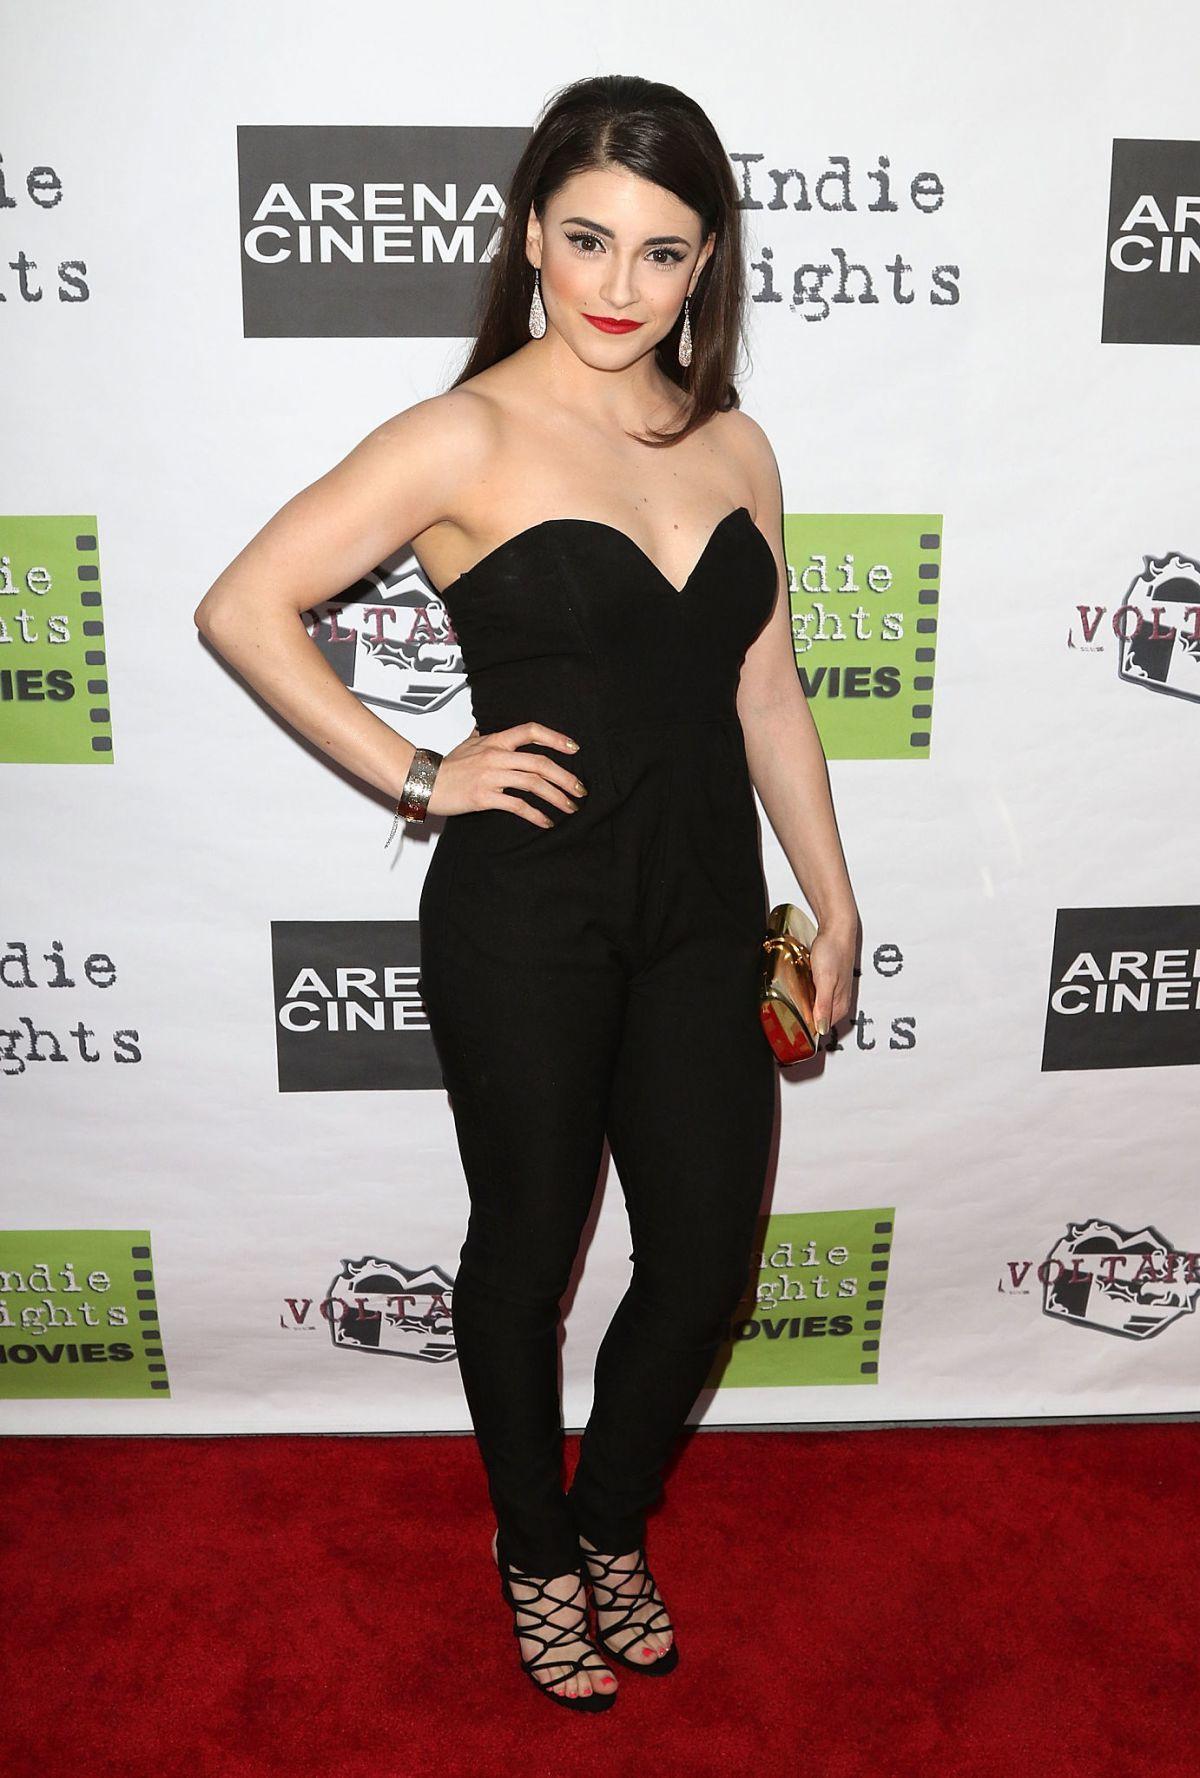 Daniela Bobadilla S Feet Wikifeet Quotations by daniela bobadilla, mexican actress, born april 4, 1993. daniela bobadilla s feet wikifeet